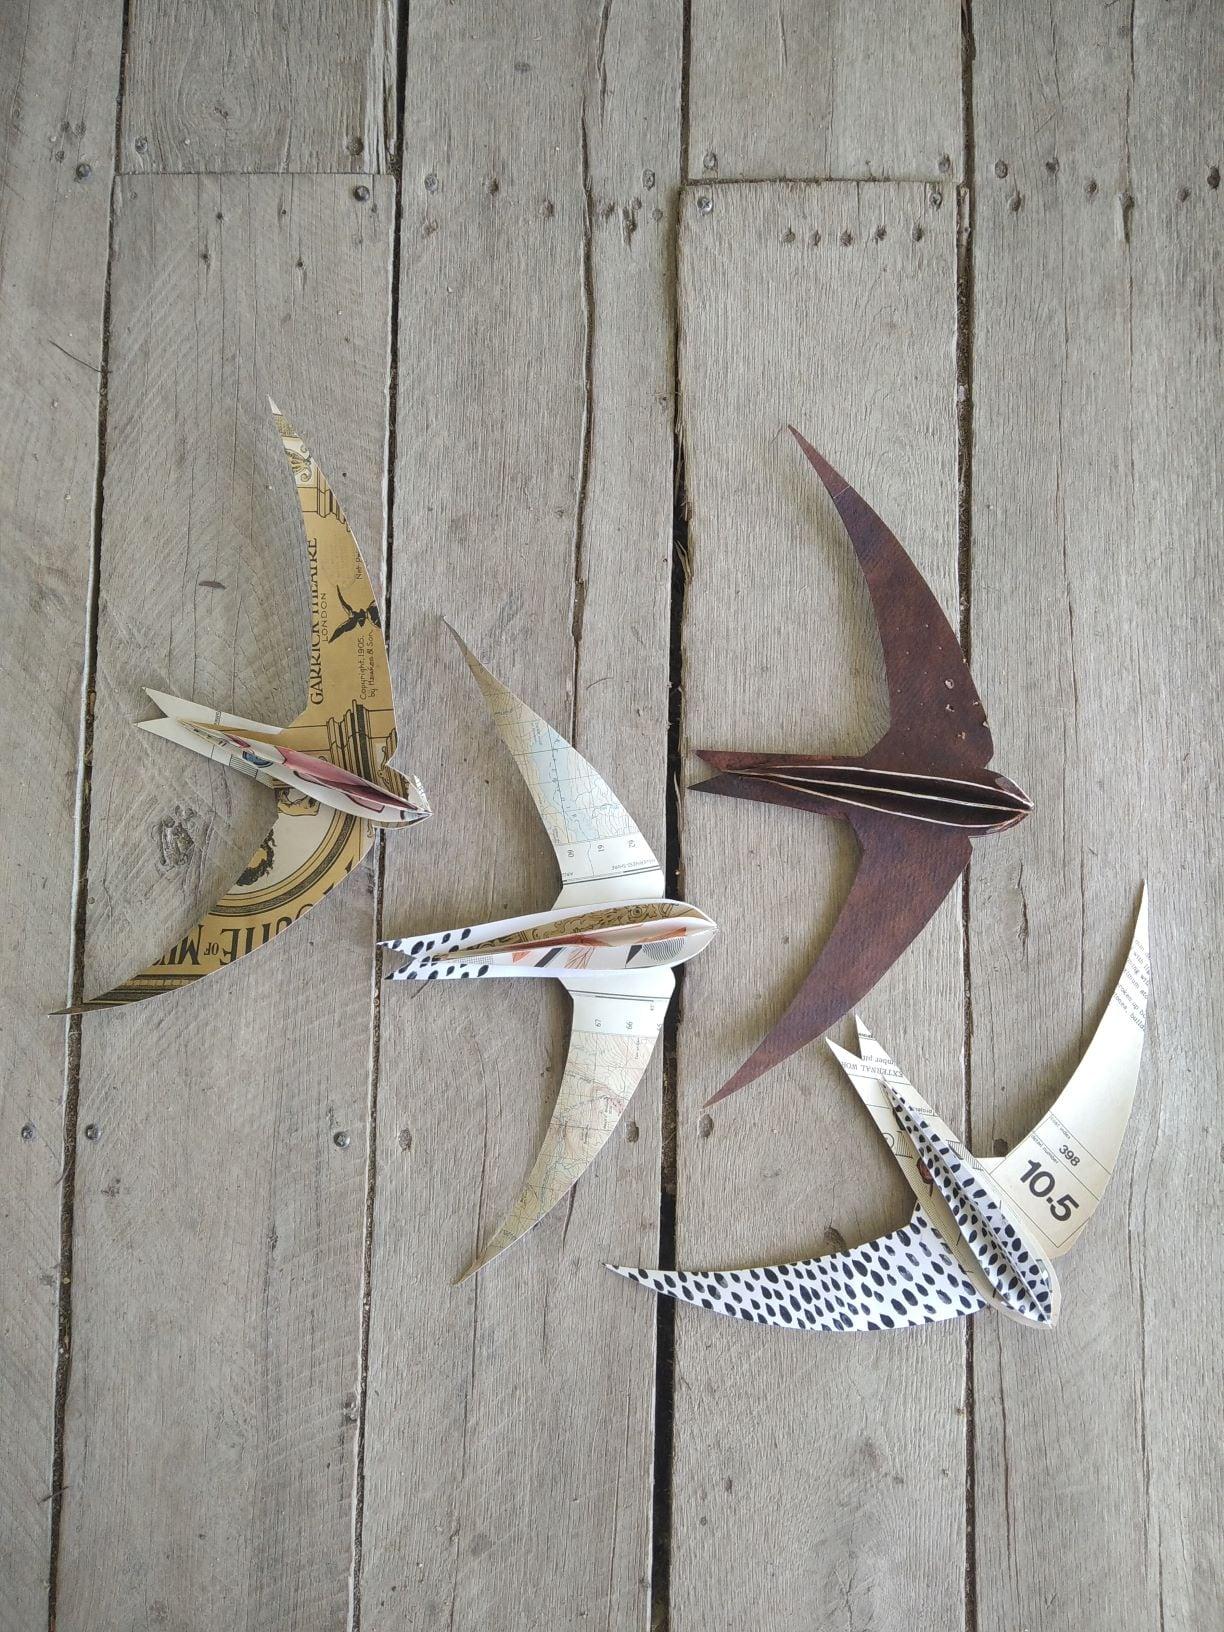 Paper Swifts